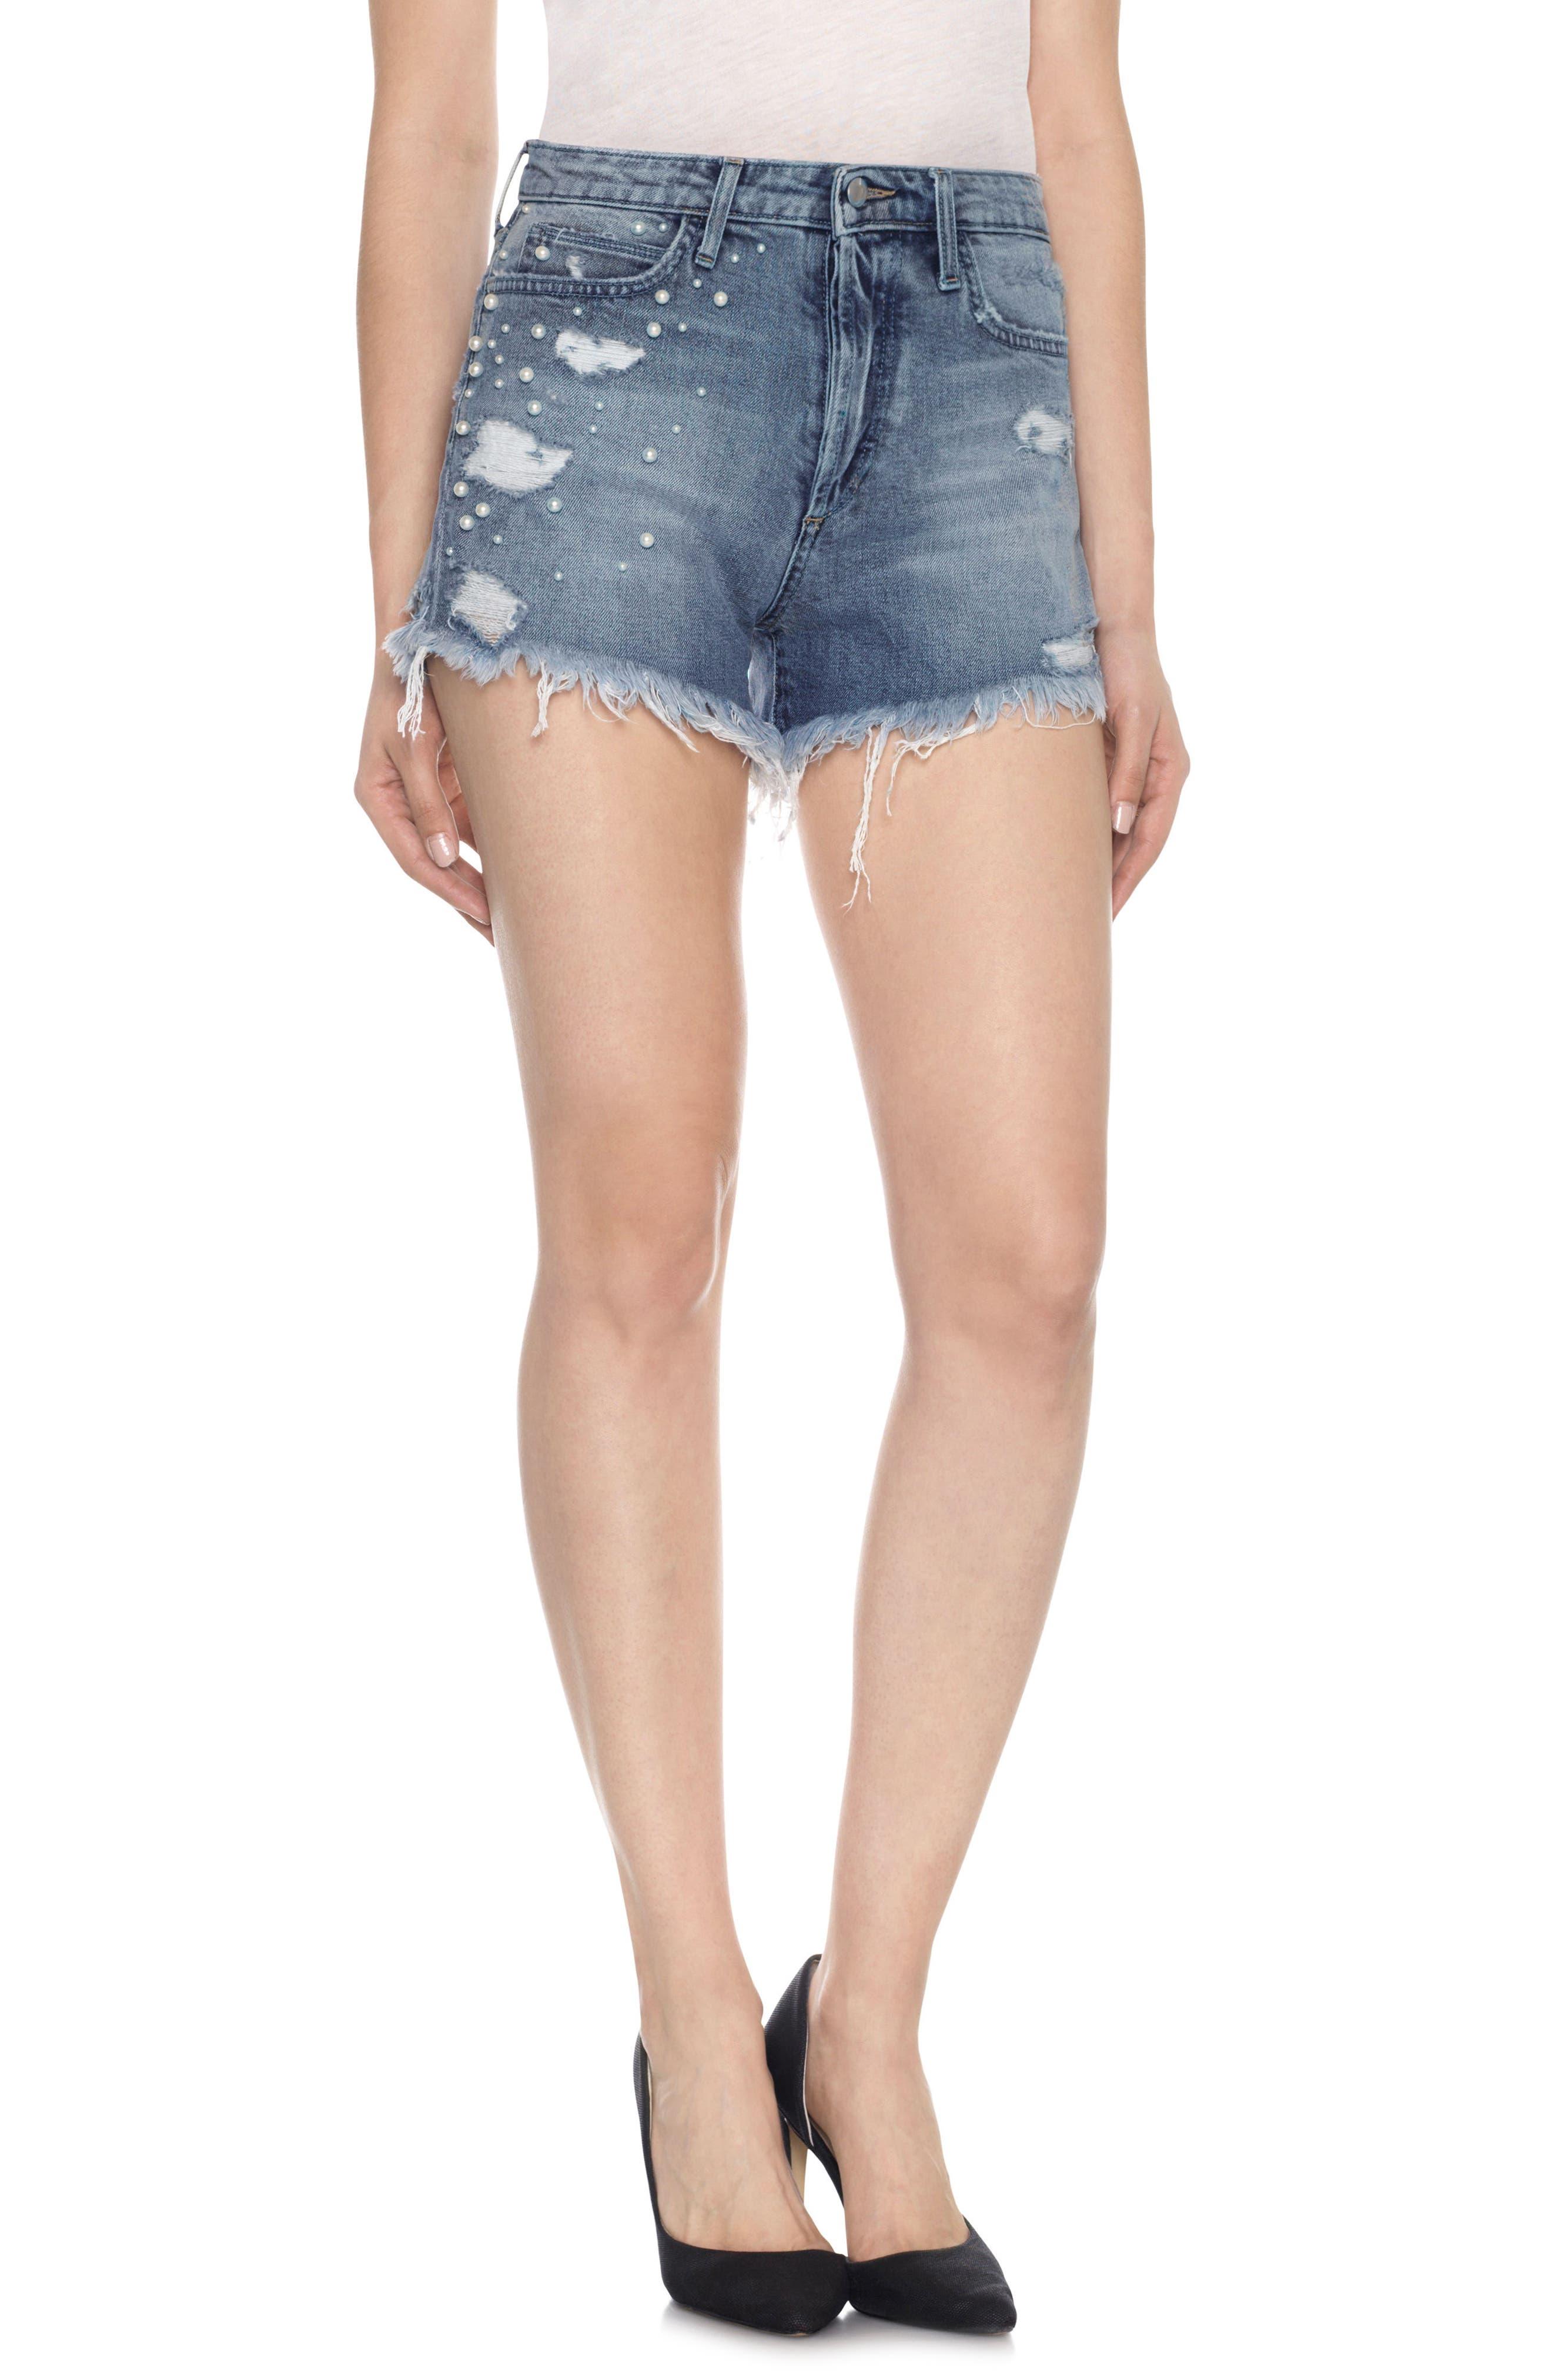 Taylor Hill x Joe's Charlie Embellished Denim Shorts (Nolita)